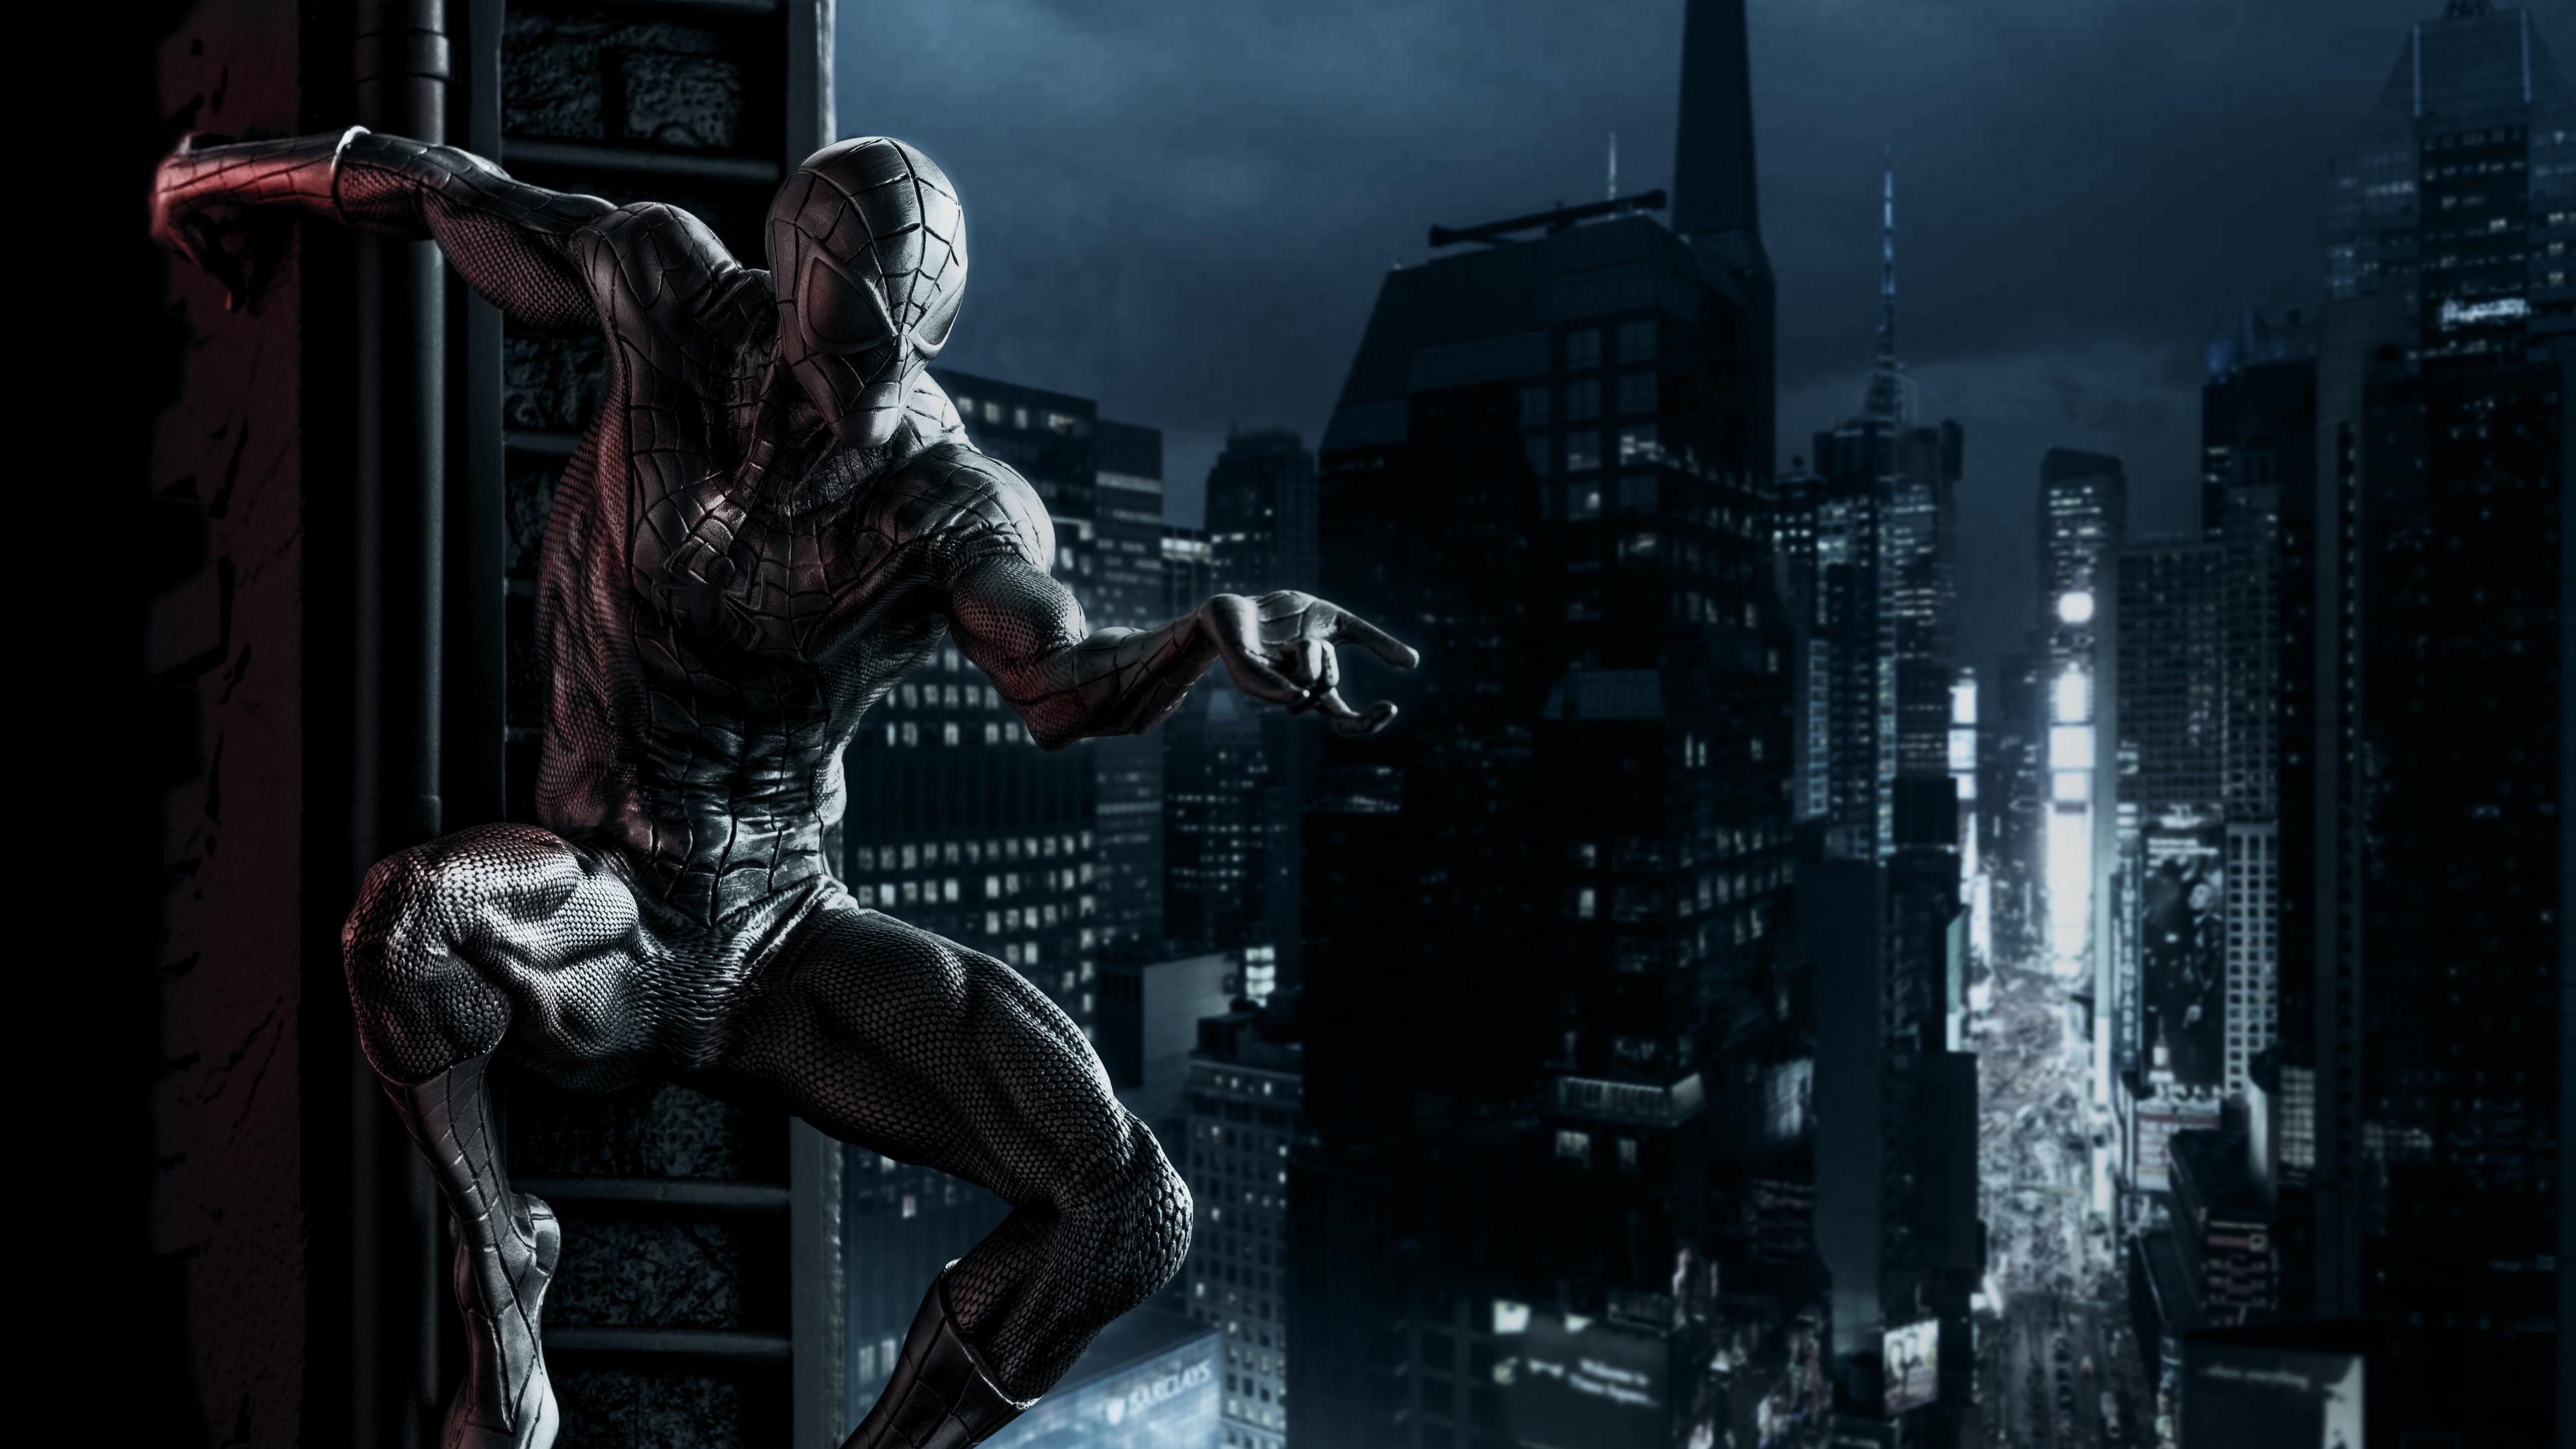 Wallpaper 4k Black Spiderman 4k 4k Wallpapers Artwork